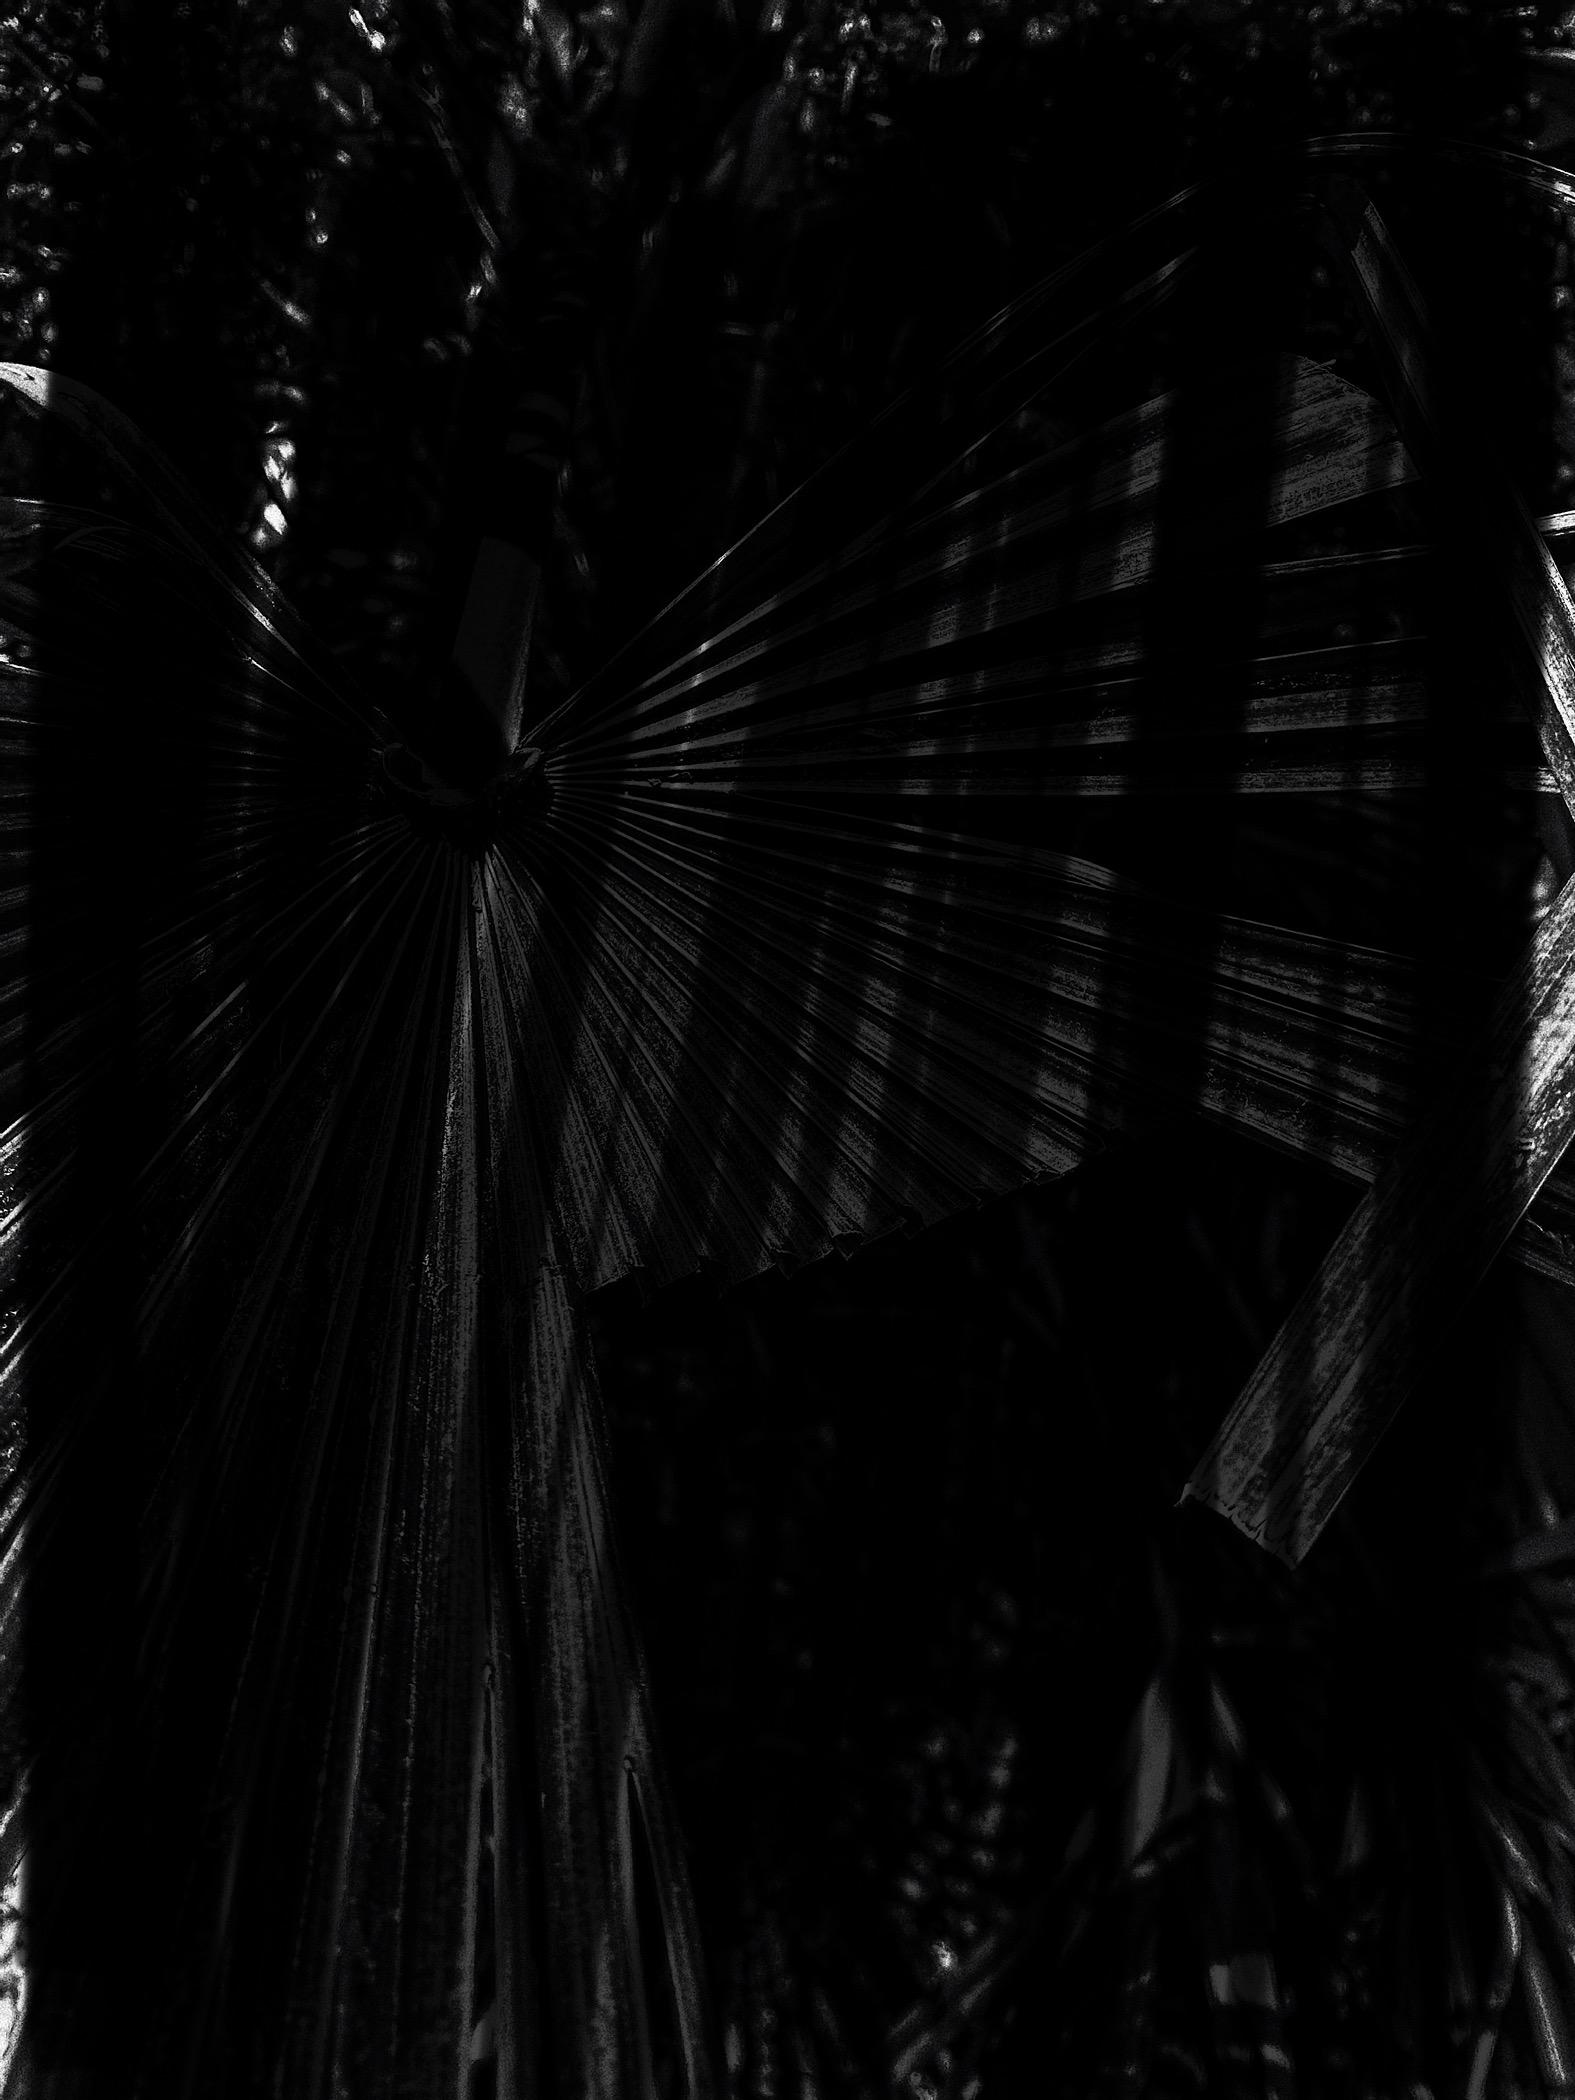 Dark Backgrounds (JPG)